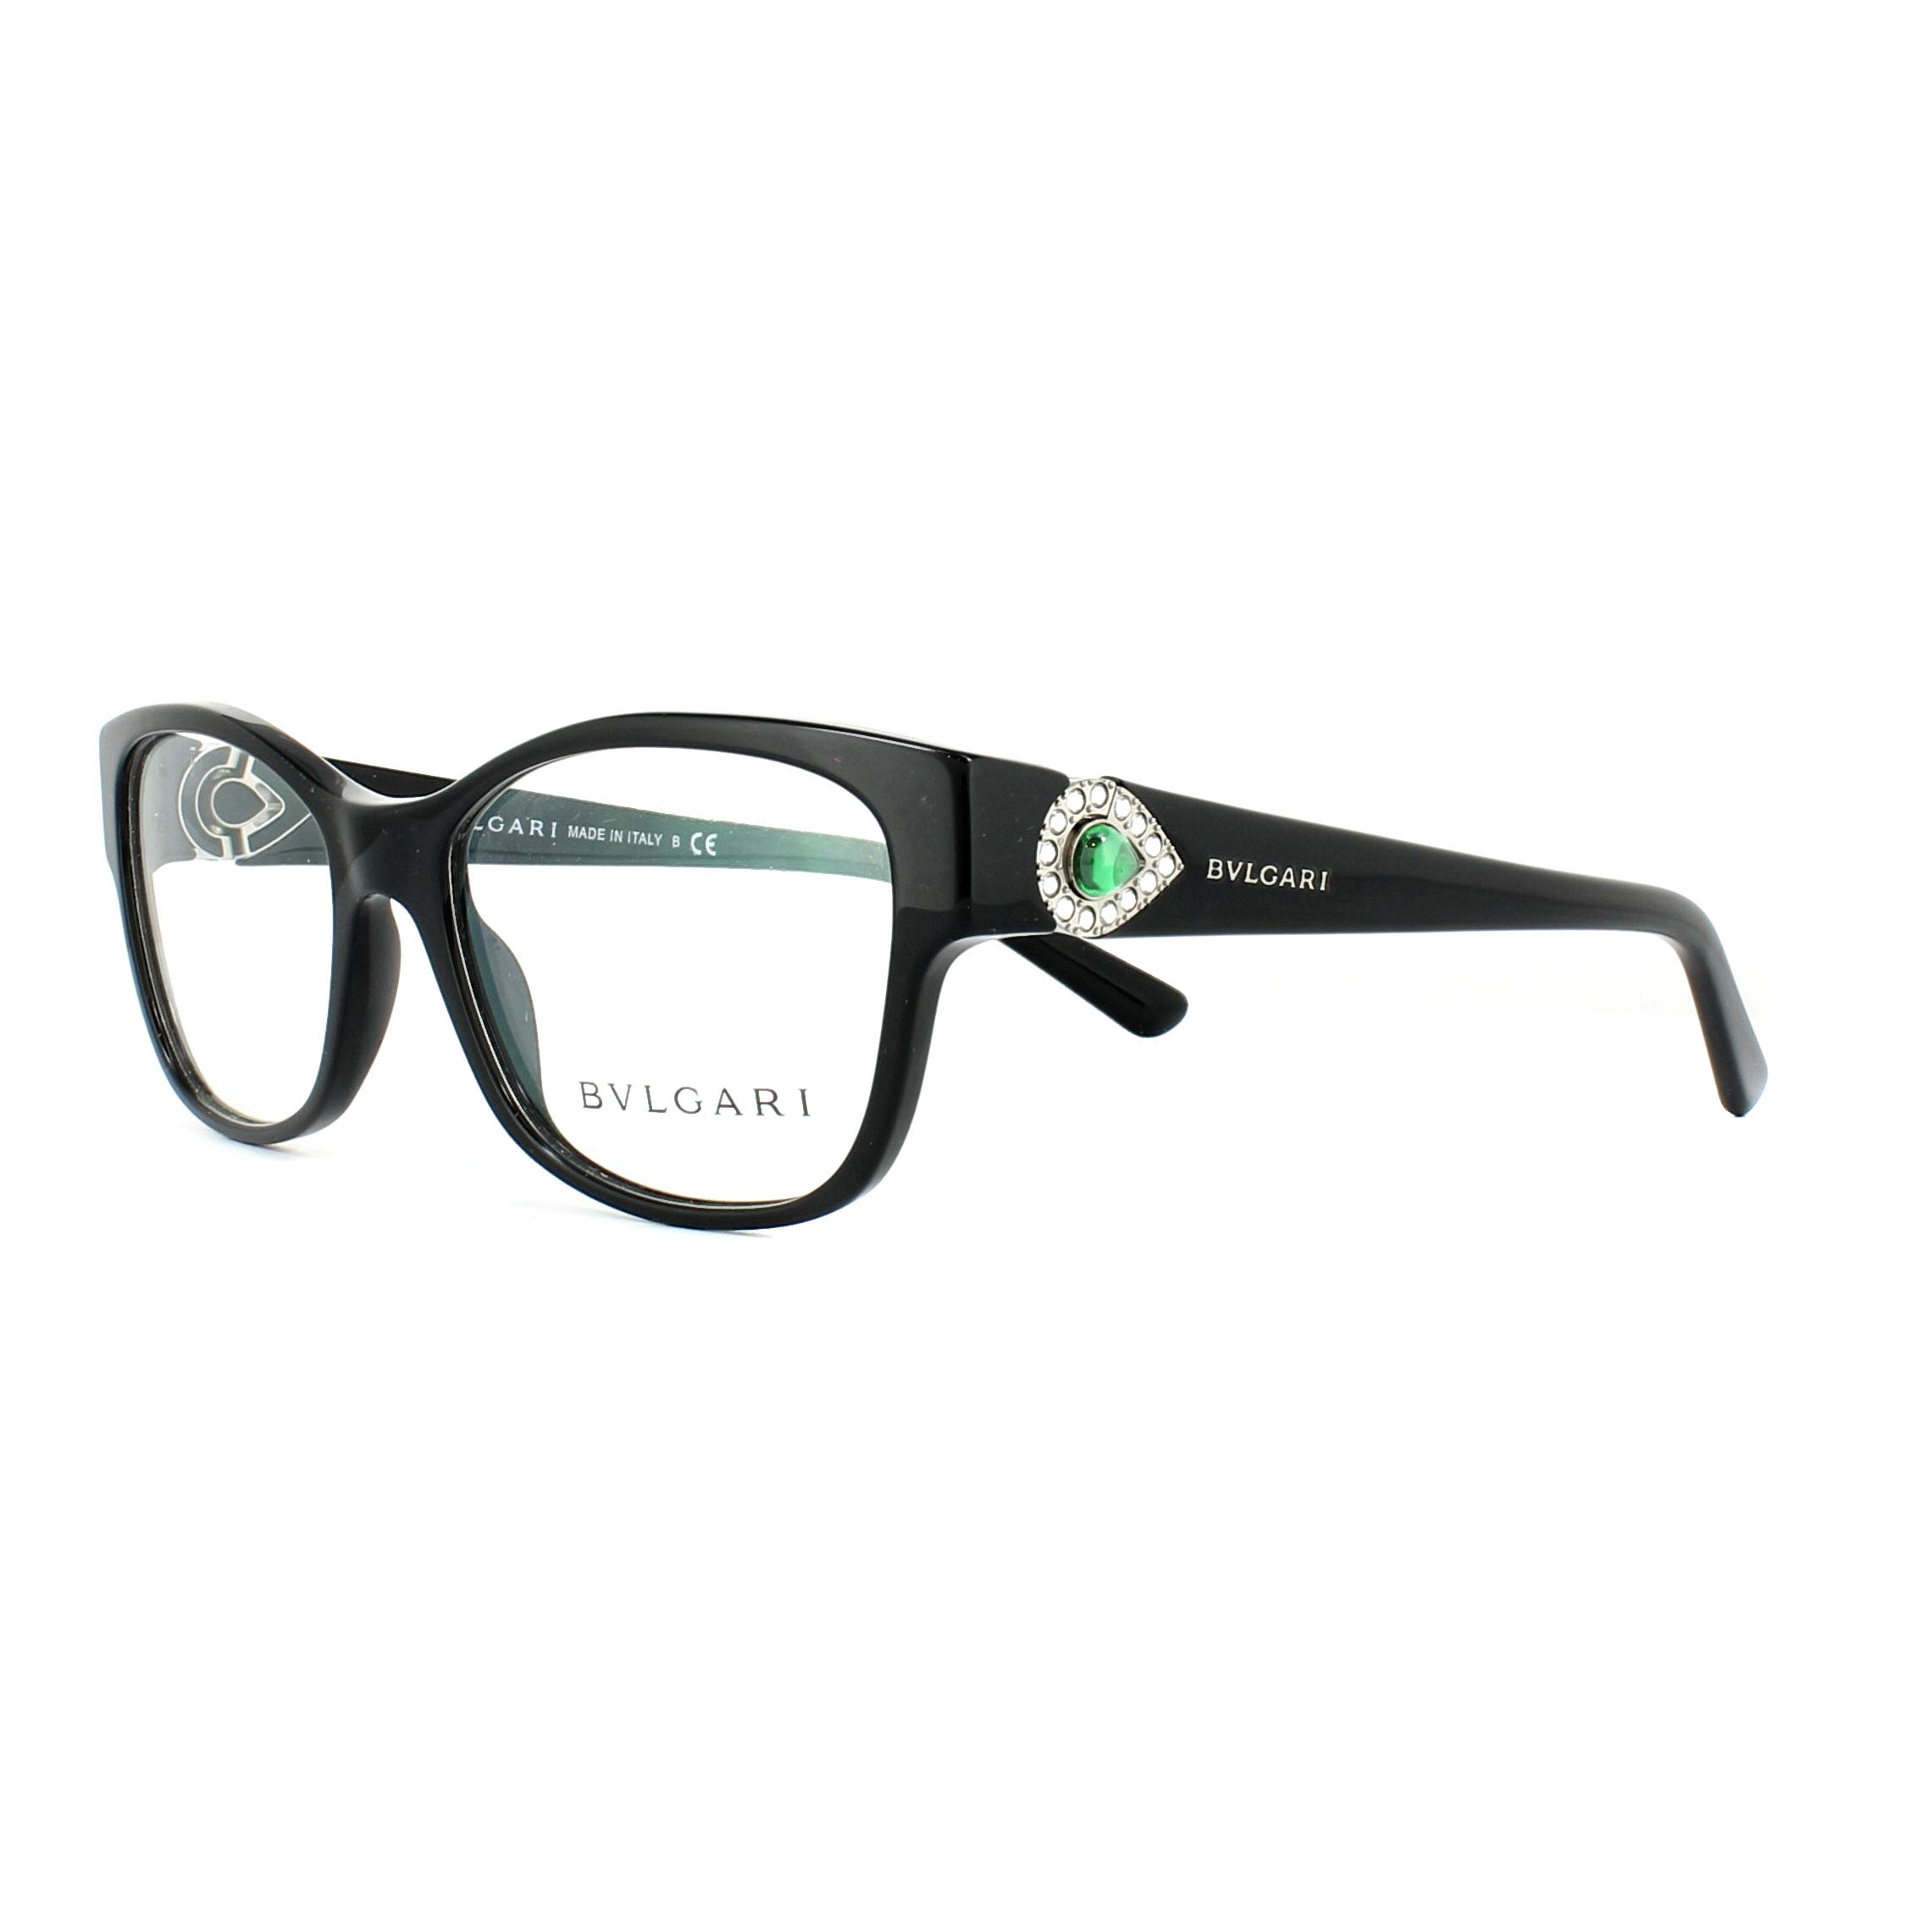 Bvlgari Glasses Frames 4074B 501 Black 53mm Womens 8053672079739 | eBay